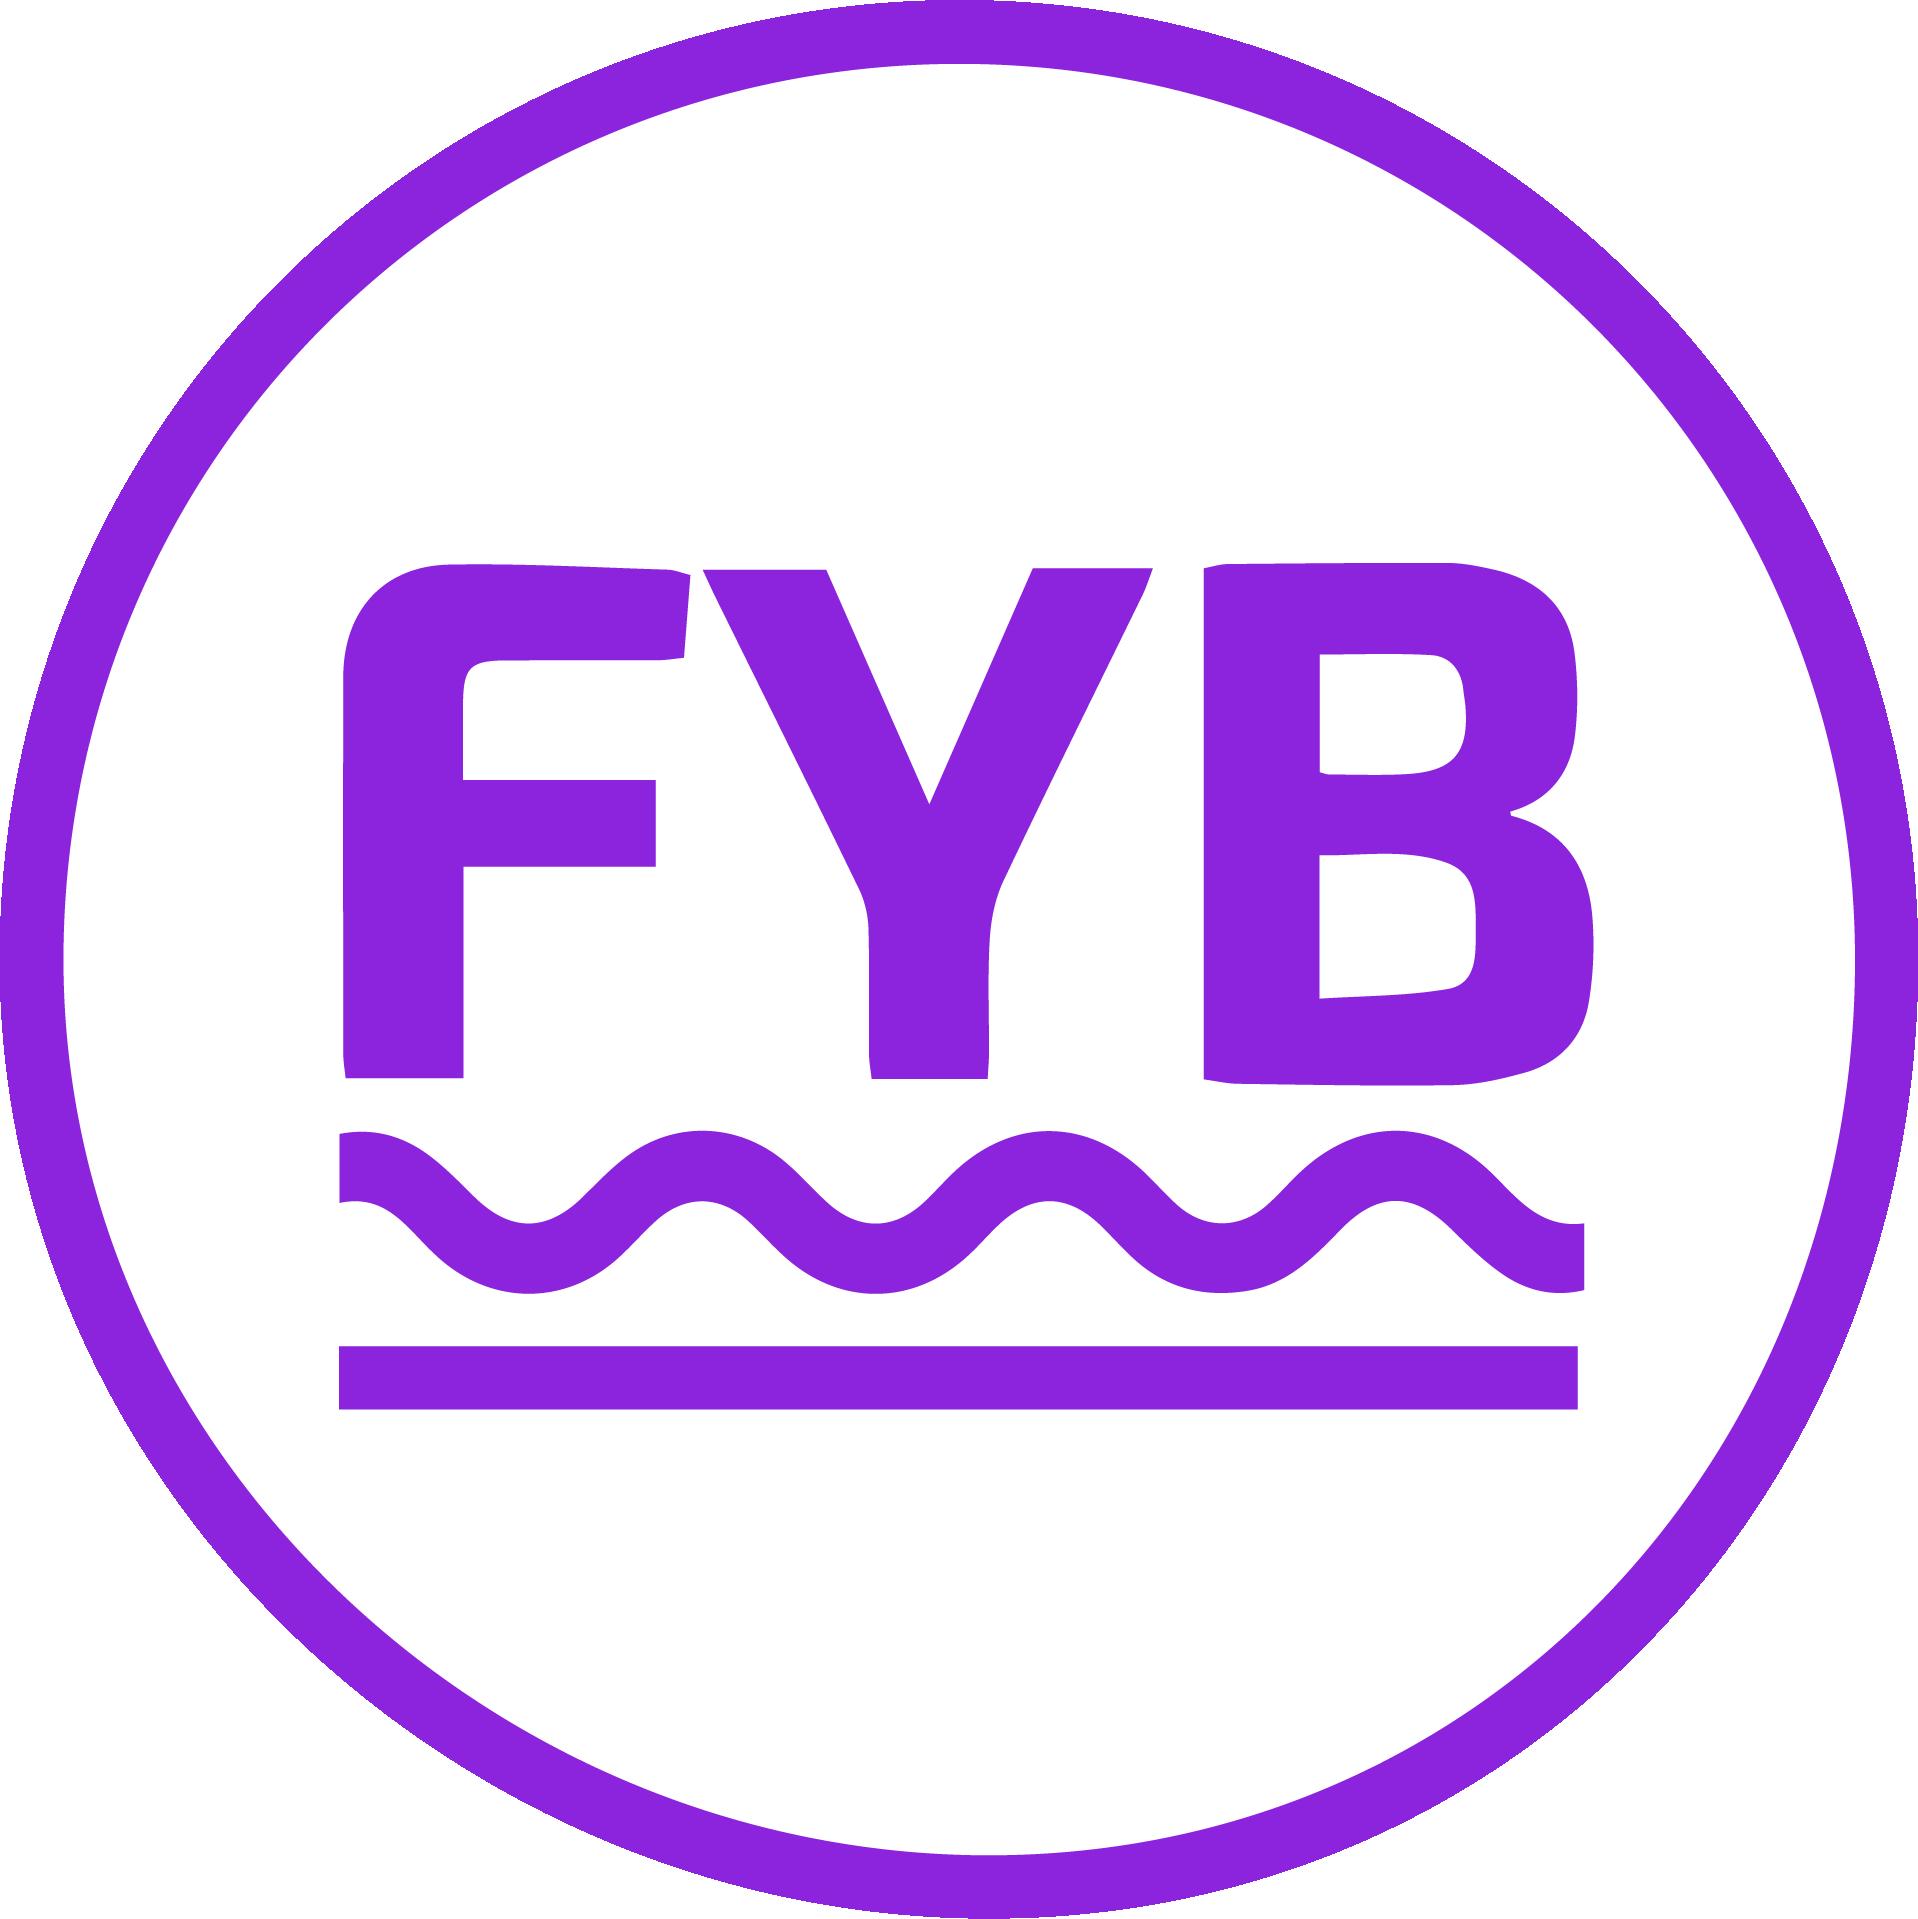 FYB-NoWords-w-White circle